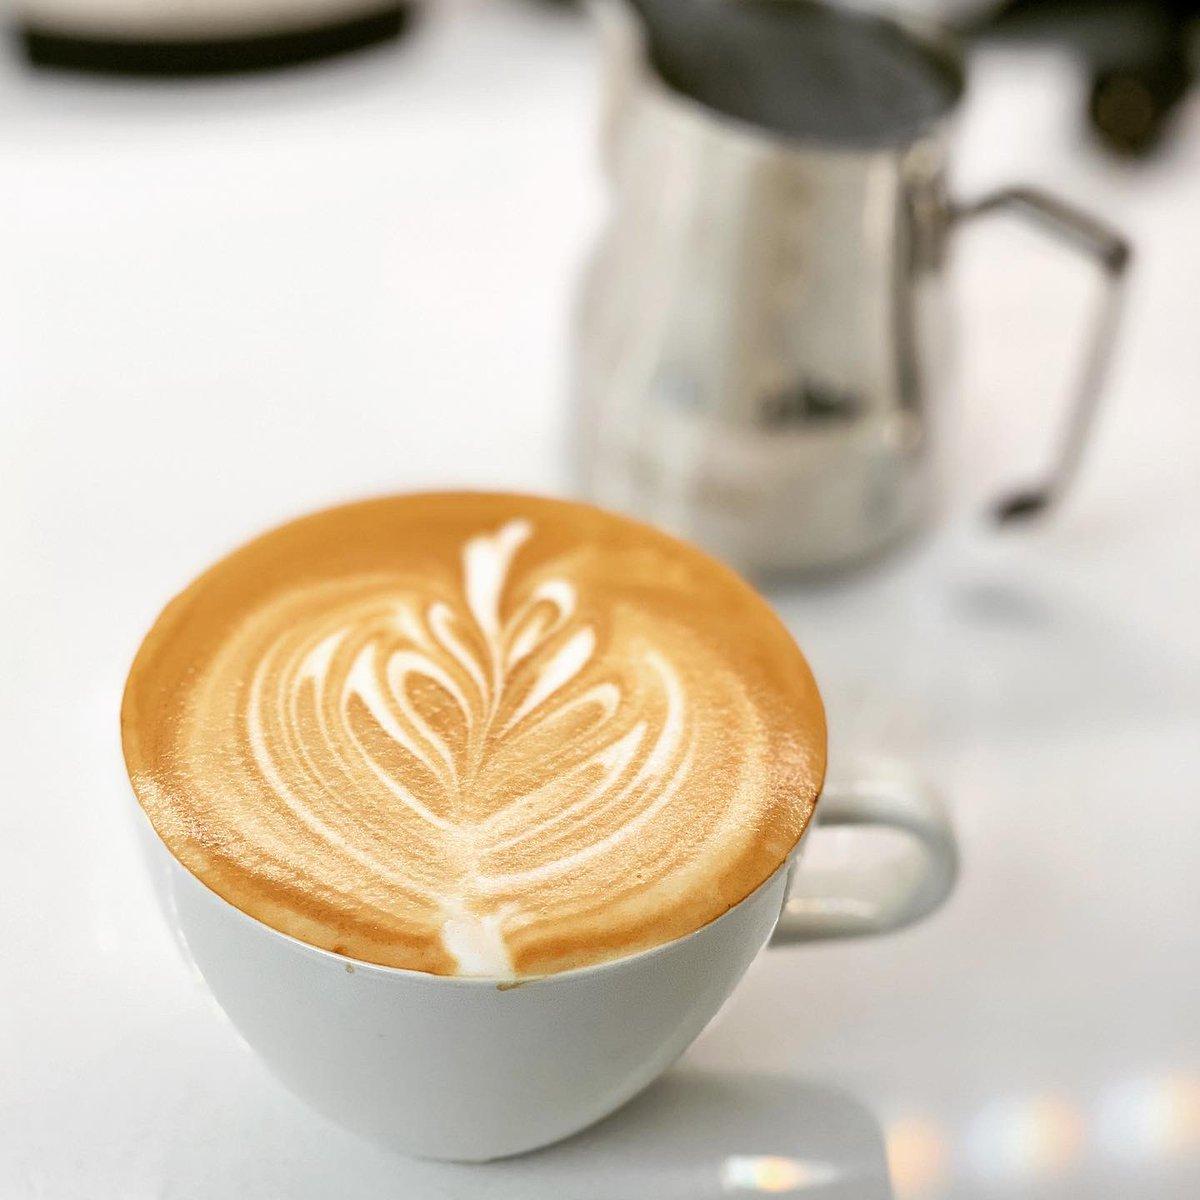 Good afternoon Tuesday  Rain  today Keep practicing social distancing  Have great day everyone! #morningcoffee #homebarista #bridgehead #baristadaily #latte #latteart #butfirstcoffee #coffeelove #coffeetime #coffeeaddict #coffeebreak #timetowakeup #coffeeholicpic.twitter.com/UlAKPp9a5G